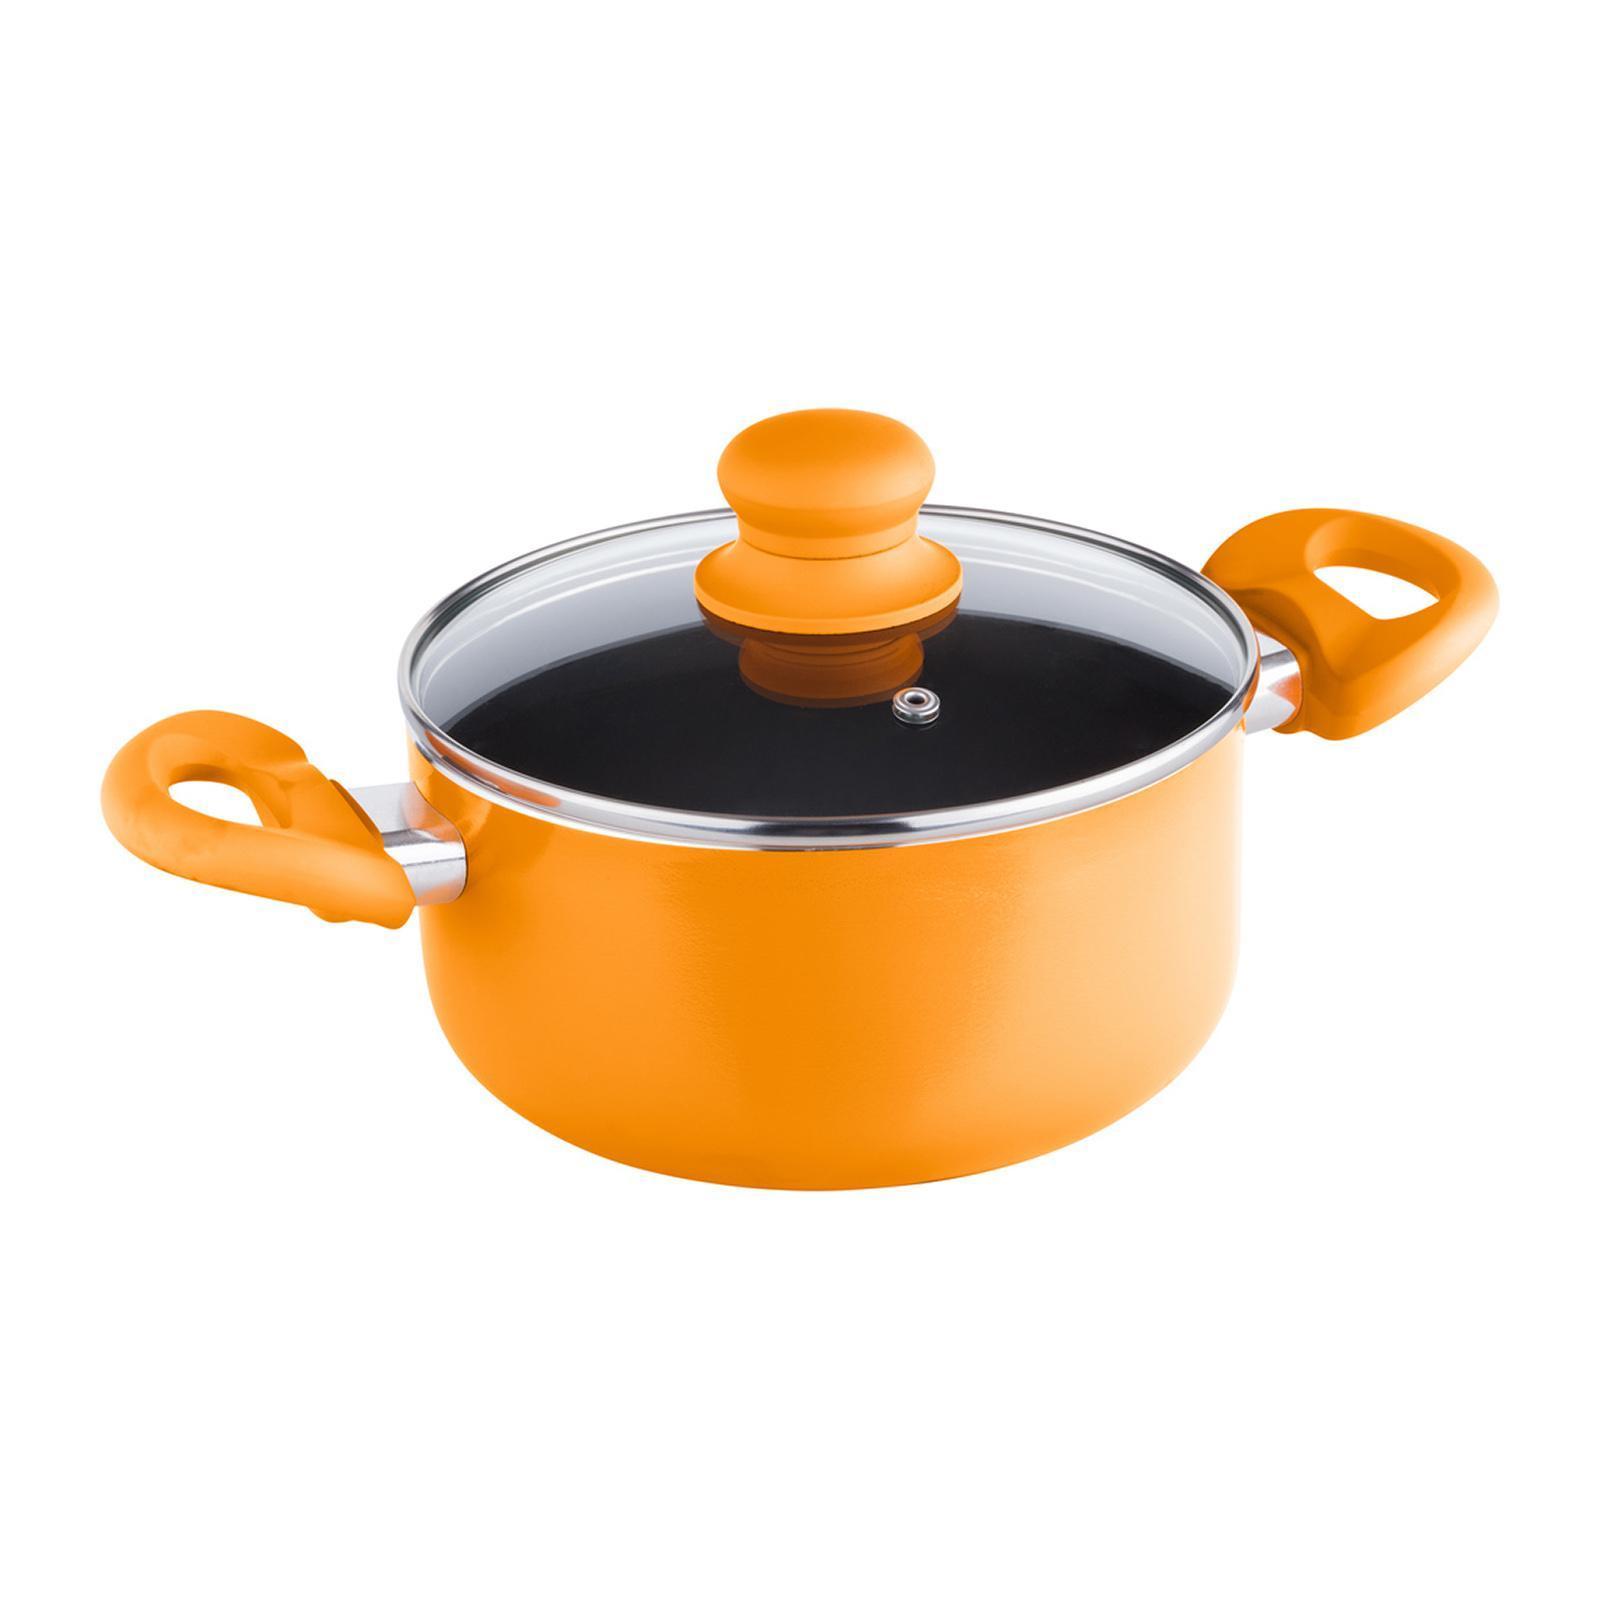 Lamart Casserole Pot 18CM Orange